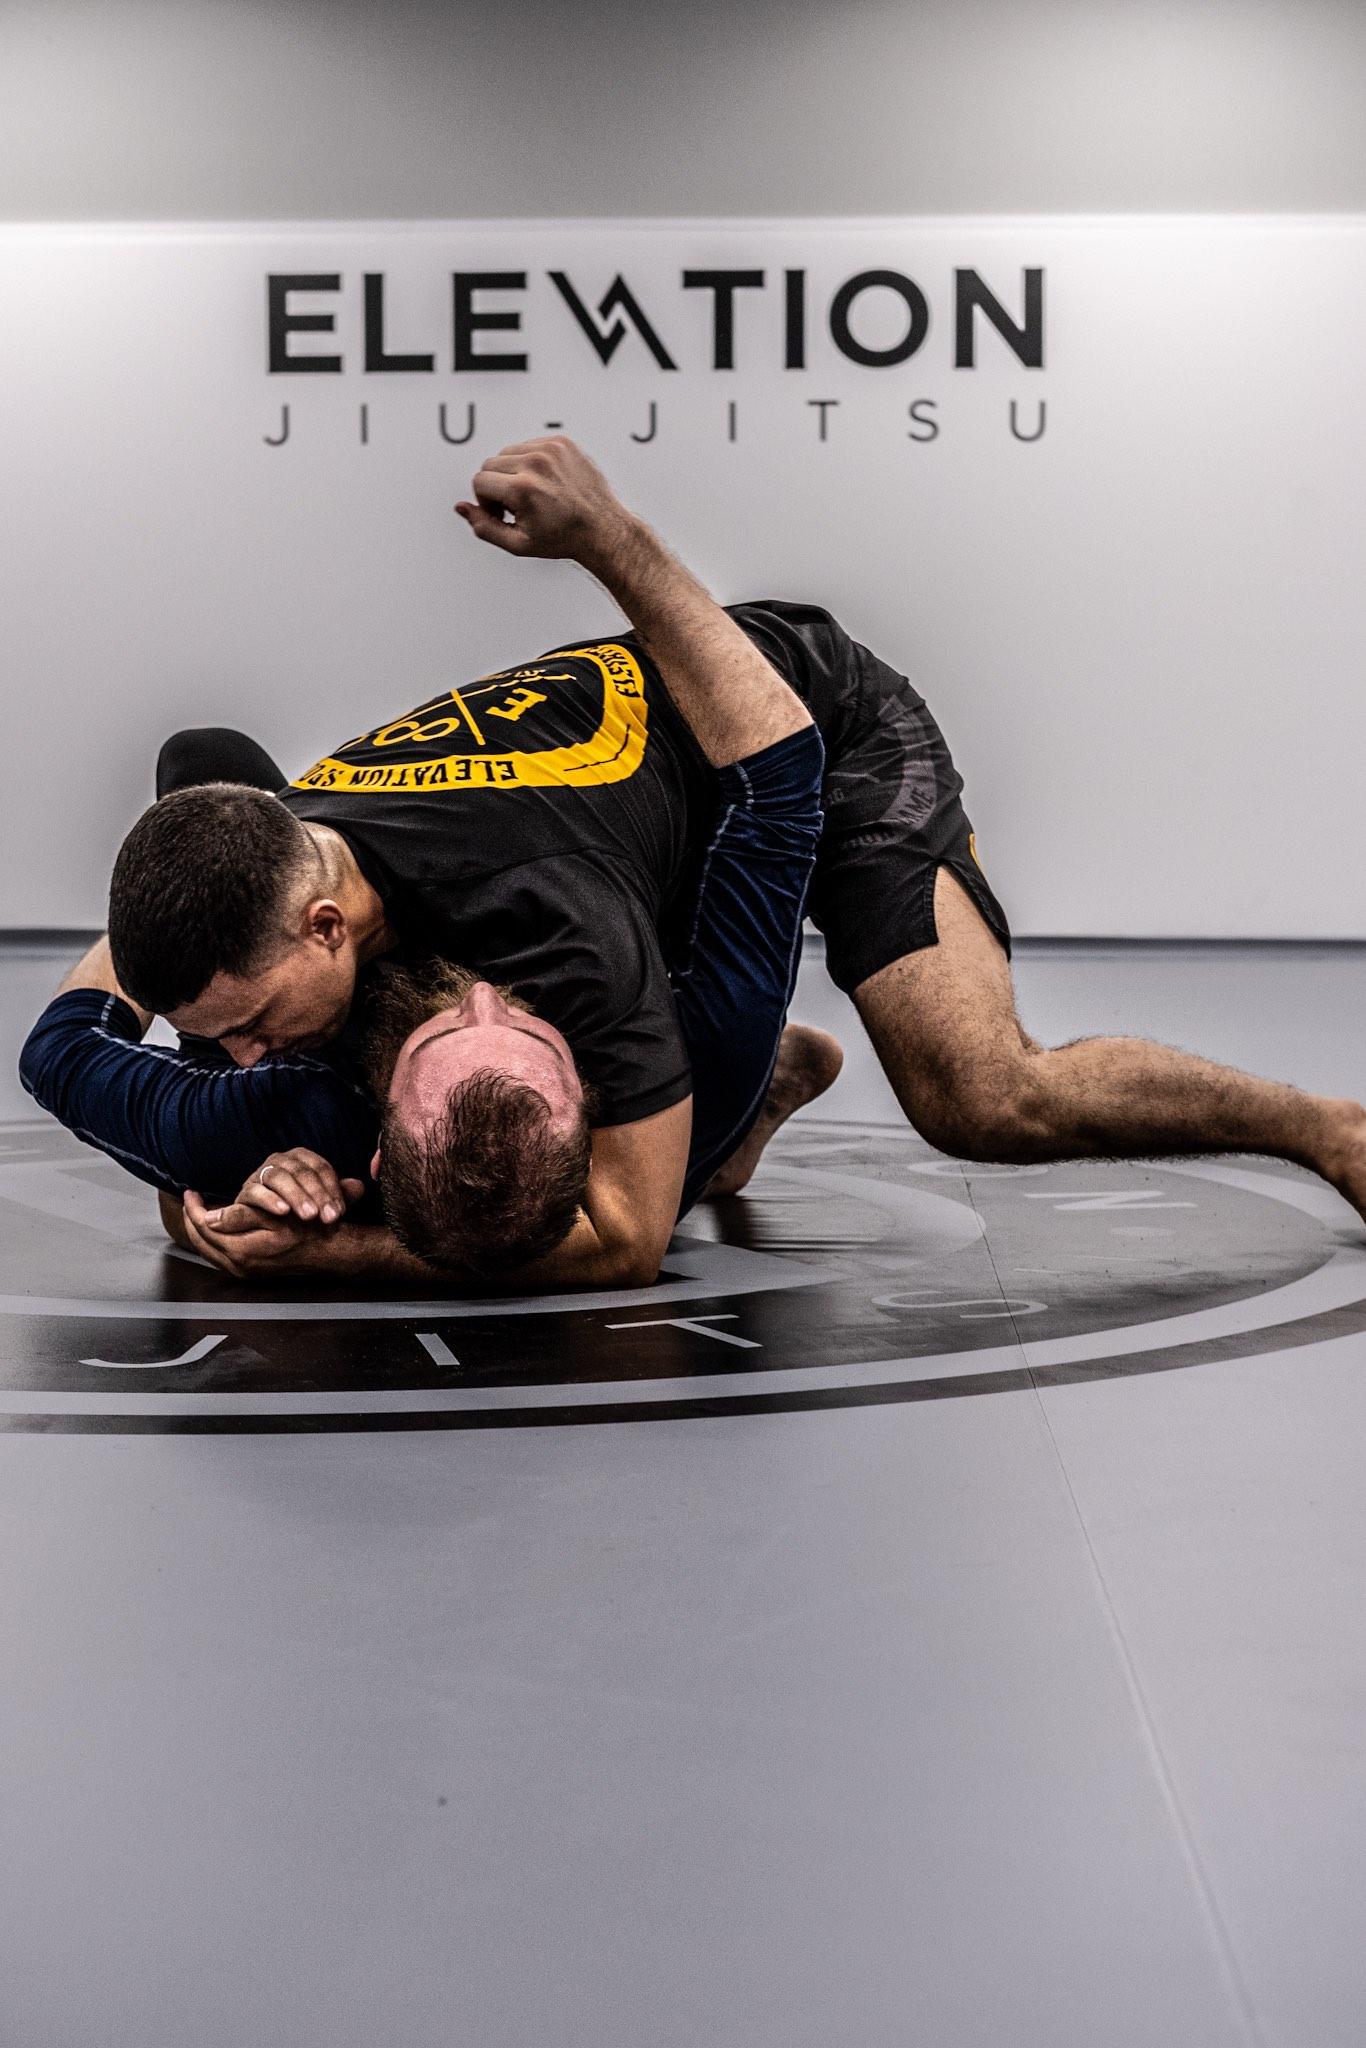 Elevation Jiu Jitsu Utrecht - BJJ Utrecht - Braziliaans Jiu Jitsu - Grappling Utrecht